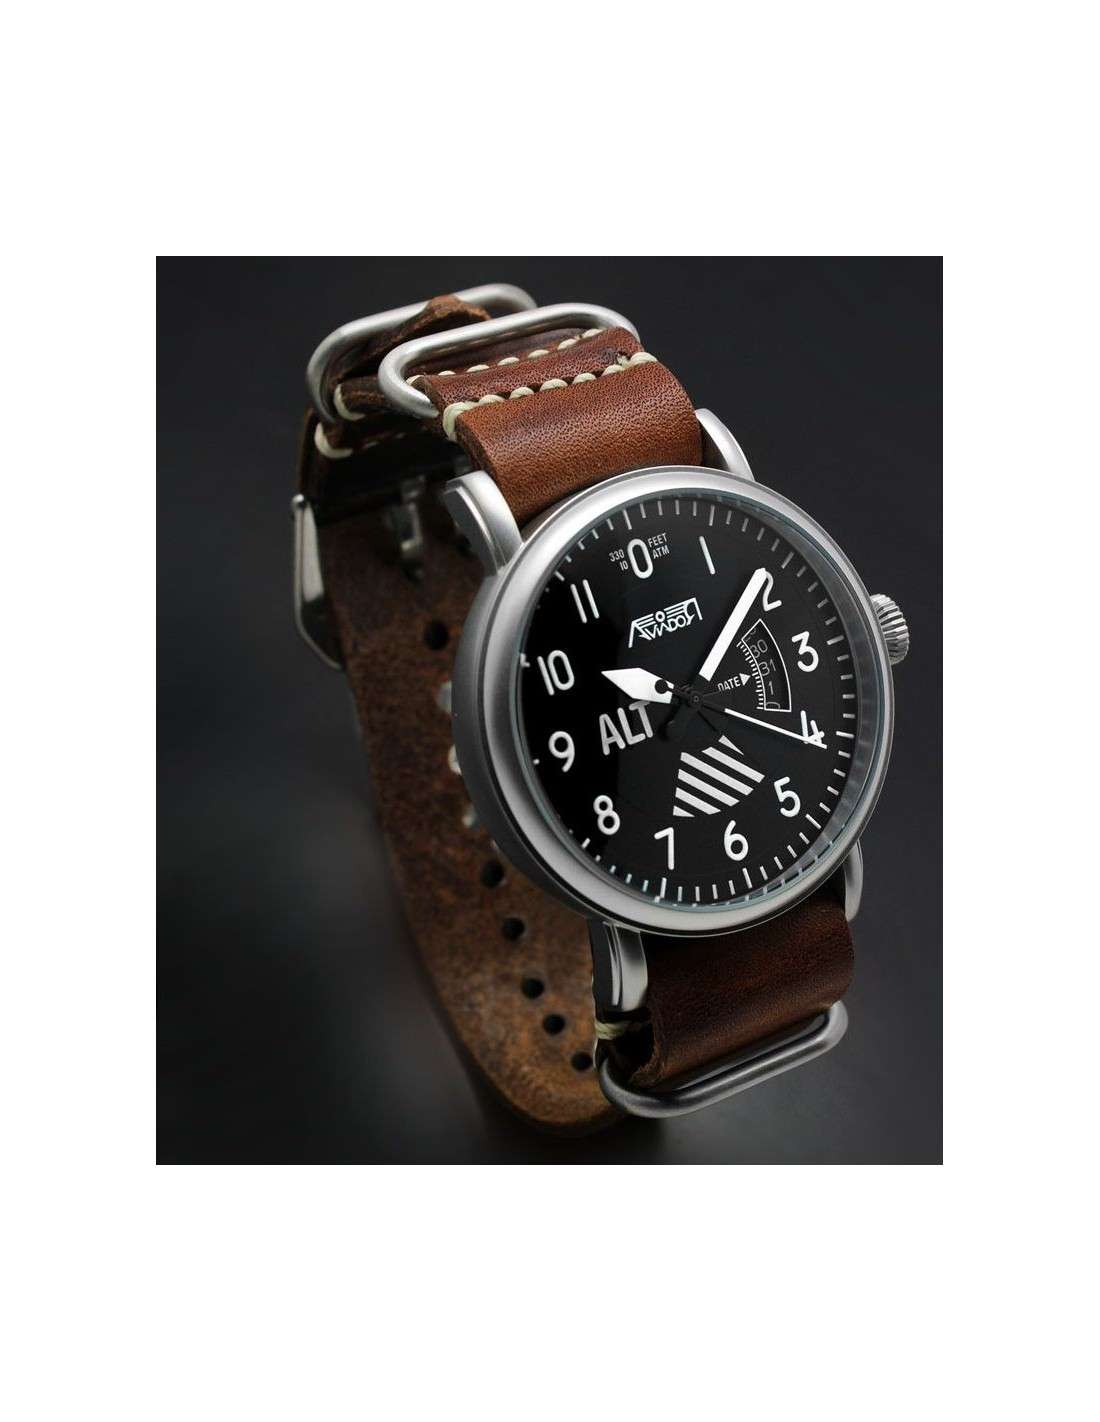 Reloj AVIADOR Altímetro AV-1201-NPM con Correa NATO Marrón en Piel 5d9ae79a141c